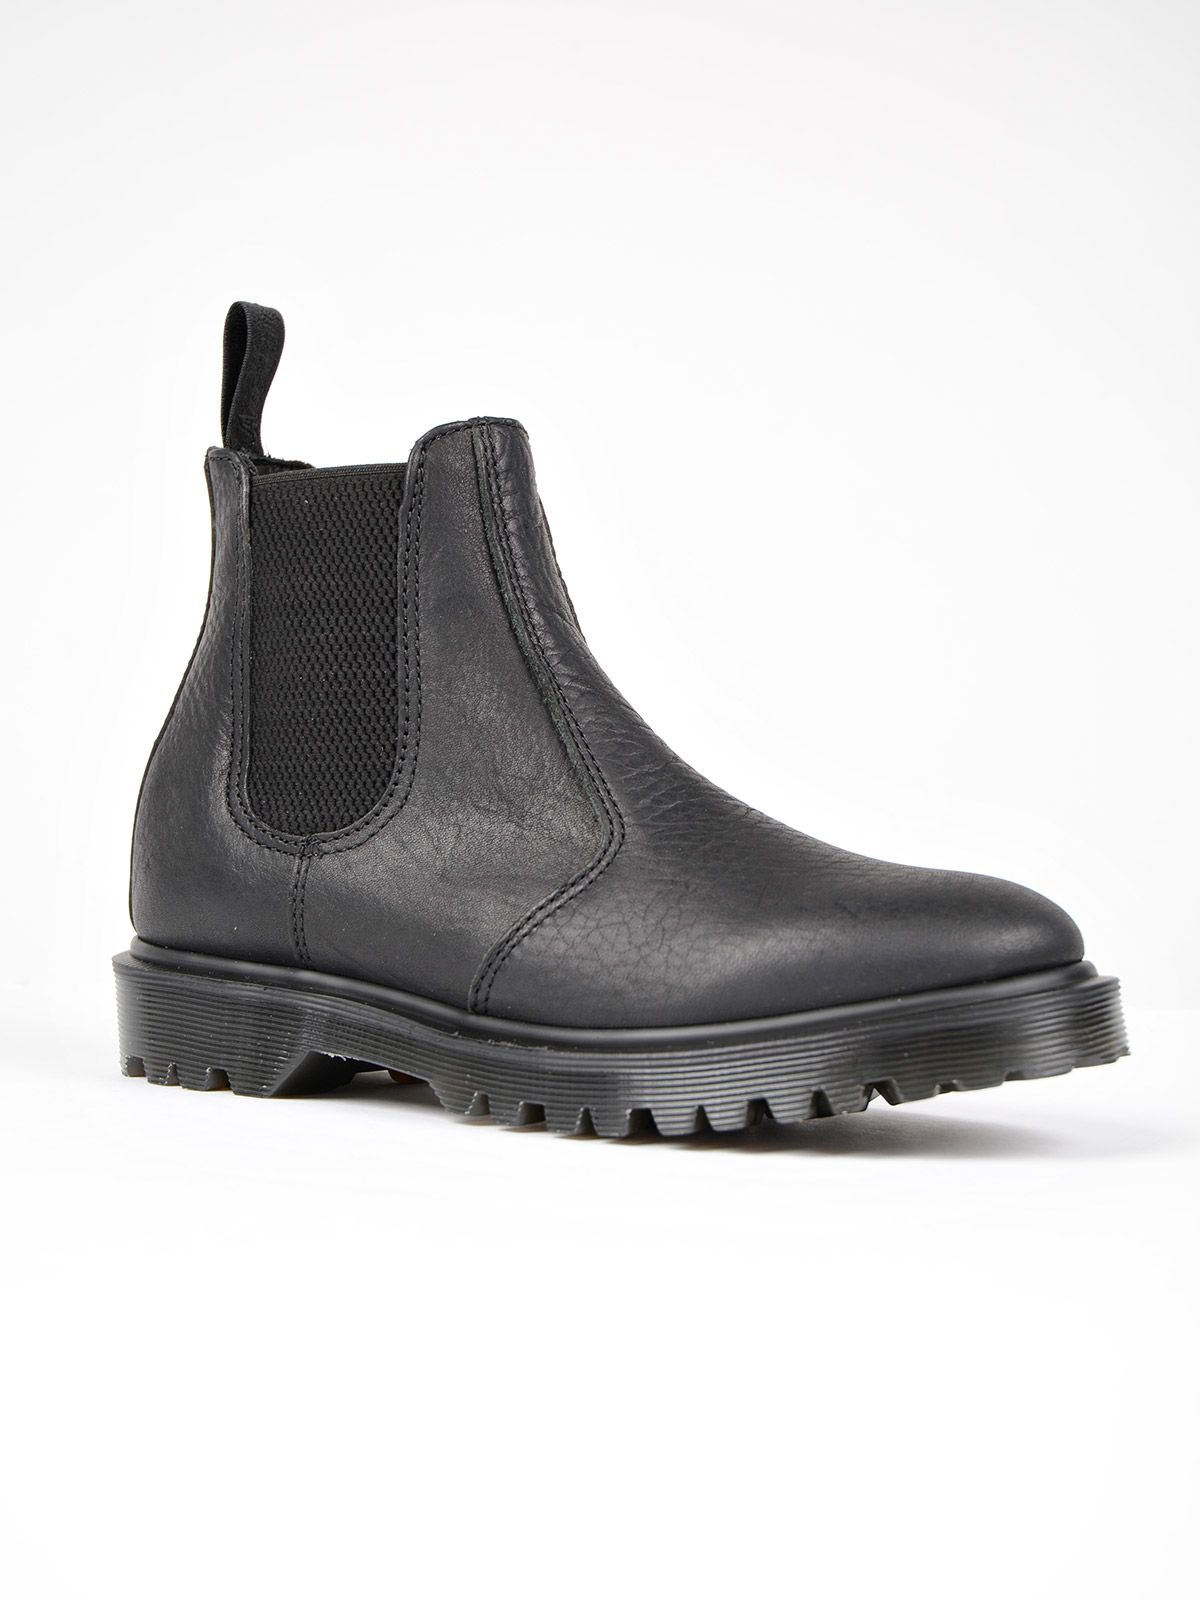 dr martens dr martens chelsea ankle boots black women 39 s boots italist. Black Bedroom Furniture Sets. Home Design Ideas